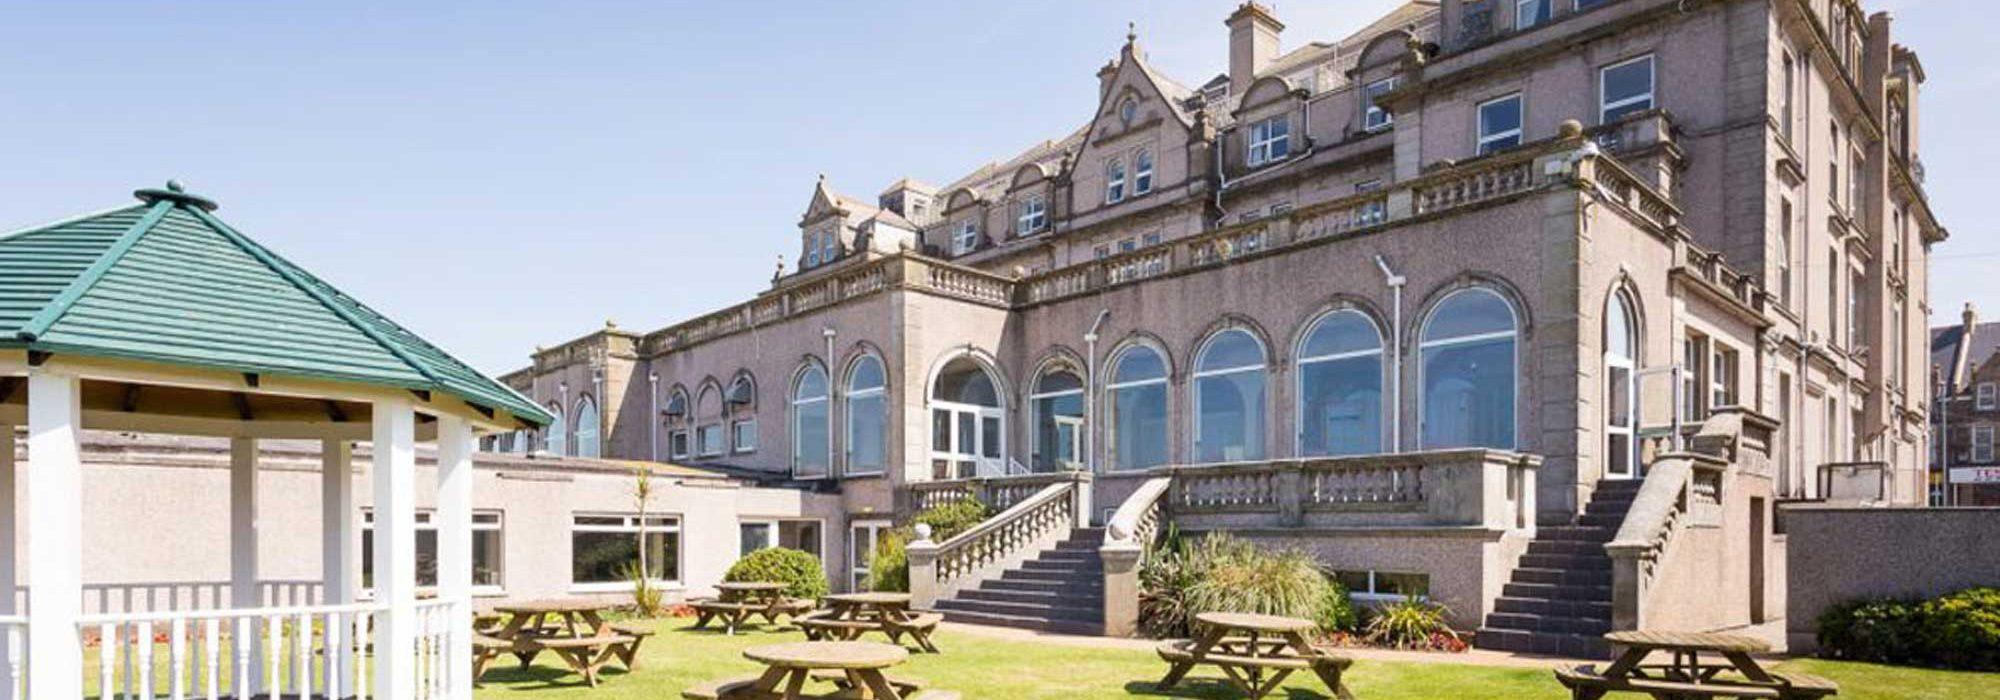 Hotel Victoria Newquay Cornwall Legacy Hotels Resorts